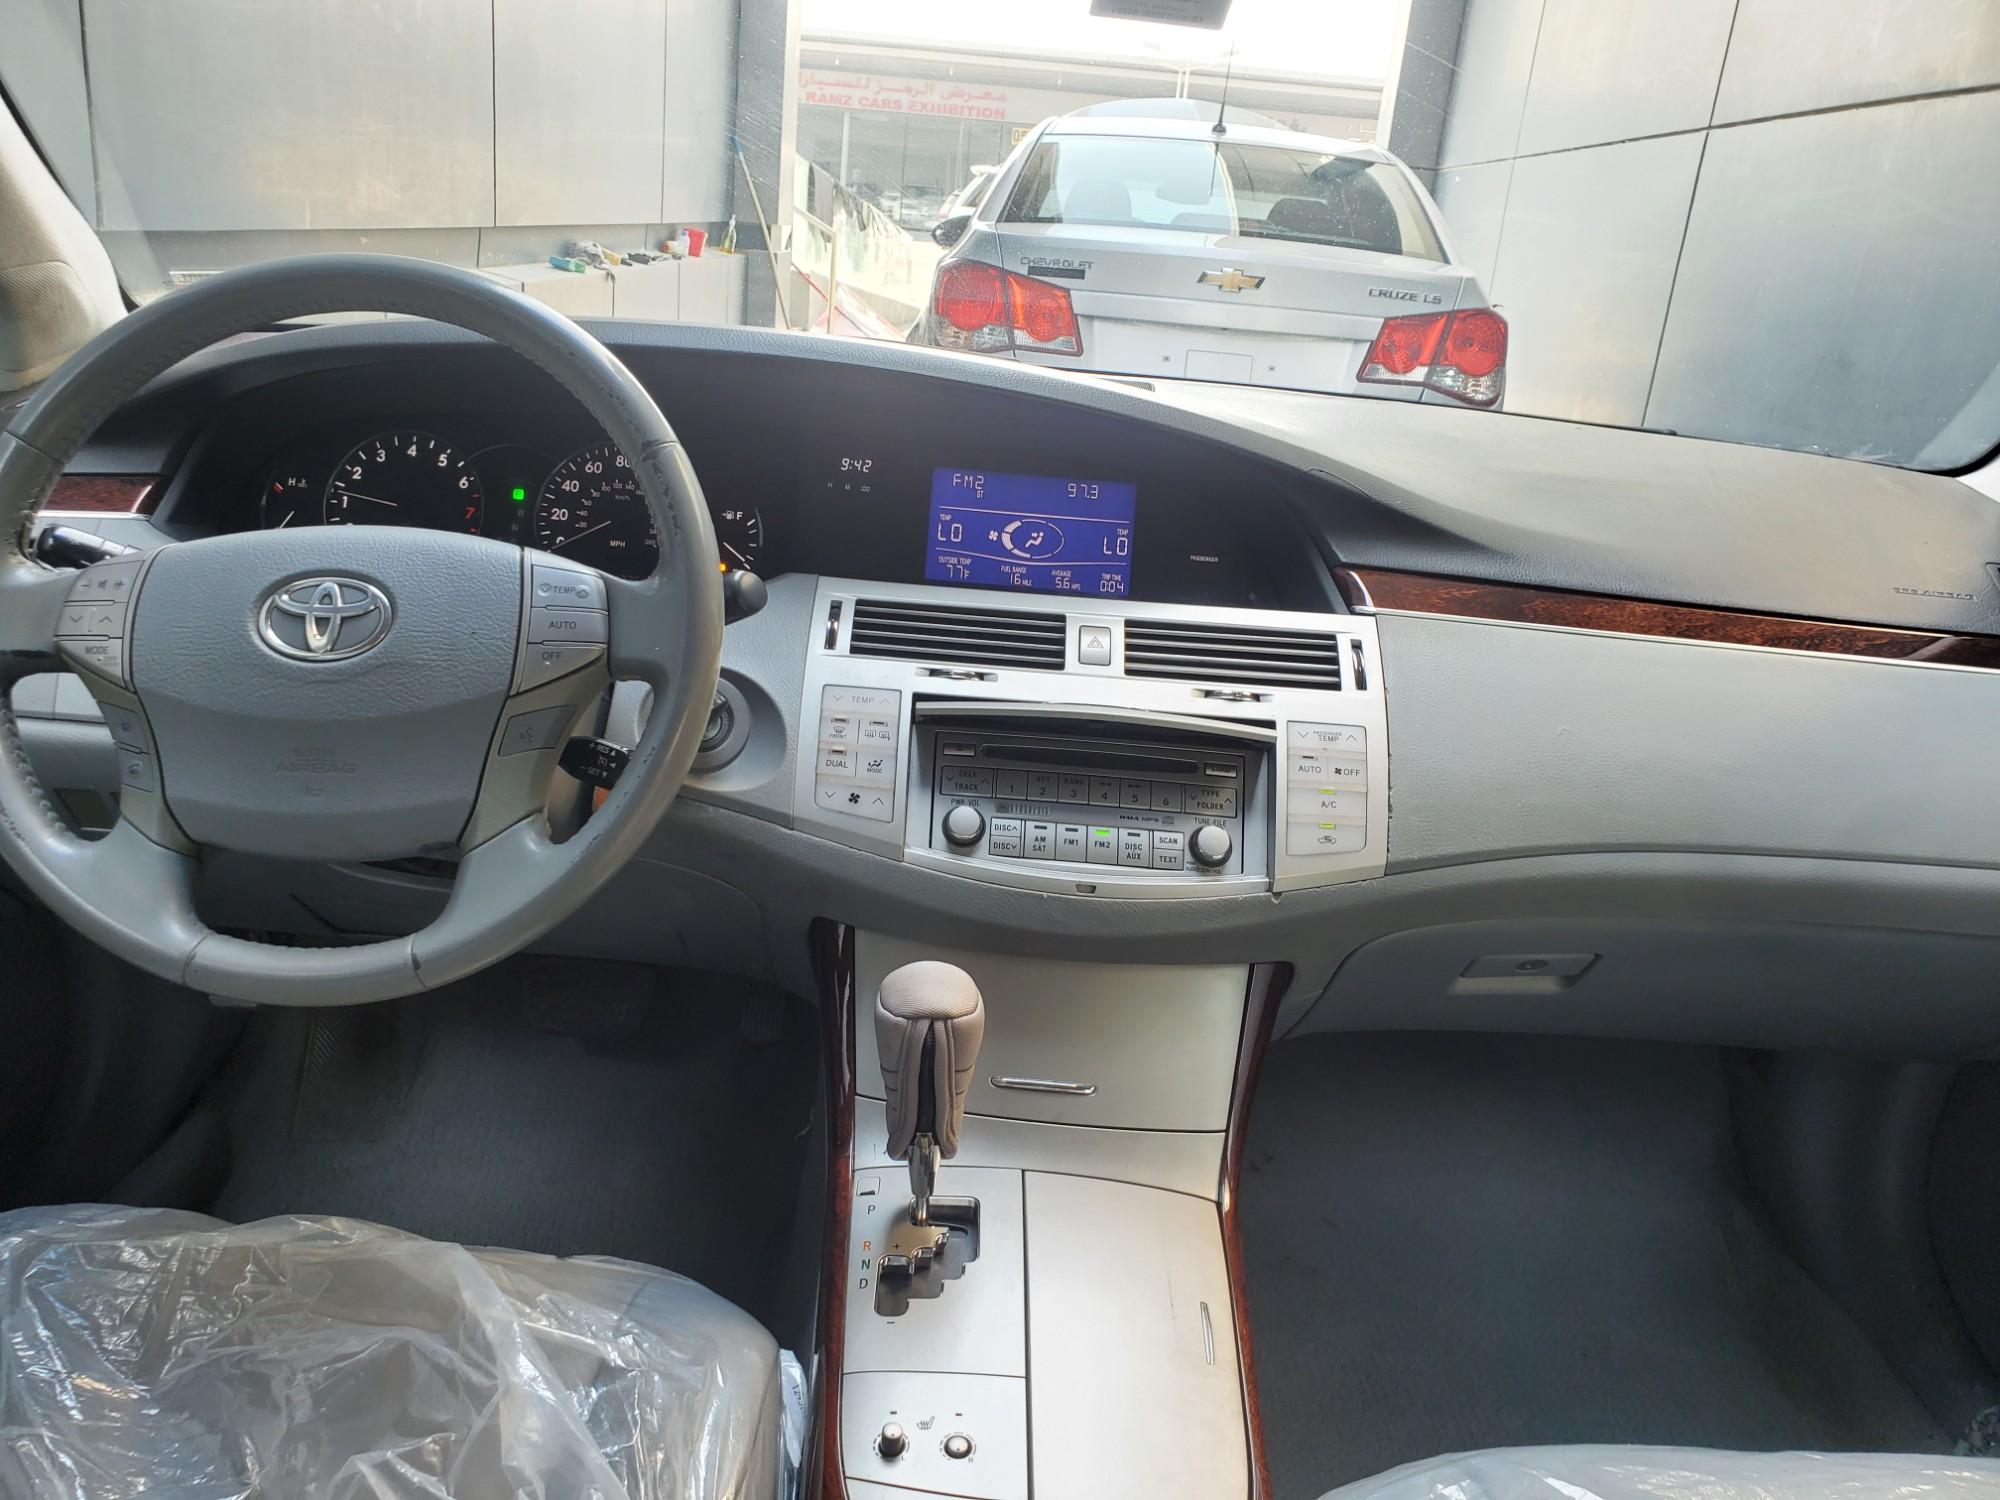 Kelebihan Toyota Avanza 2008 Spesifikasi